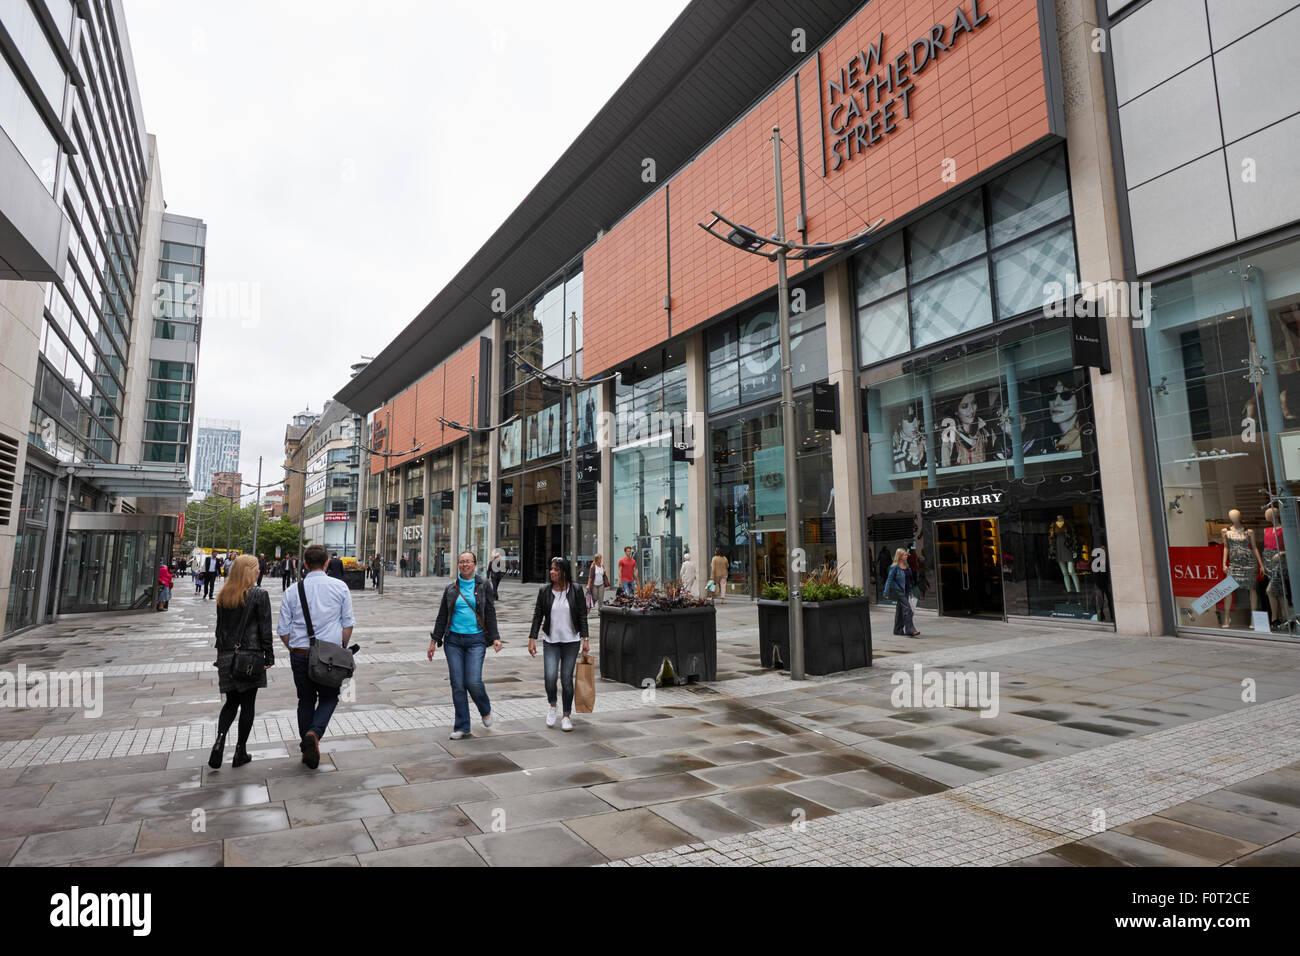 New Cathedral street upmarket shopping area Manchester England UK - Stock Image